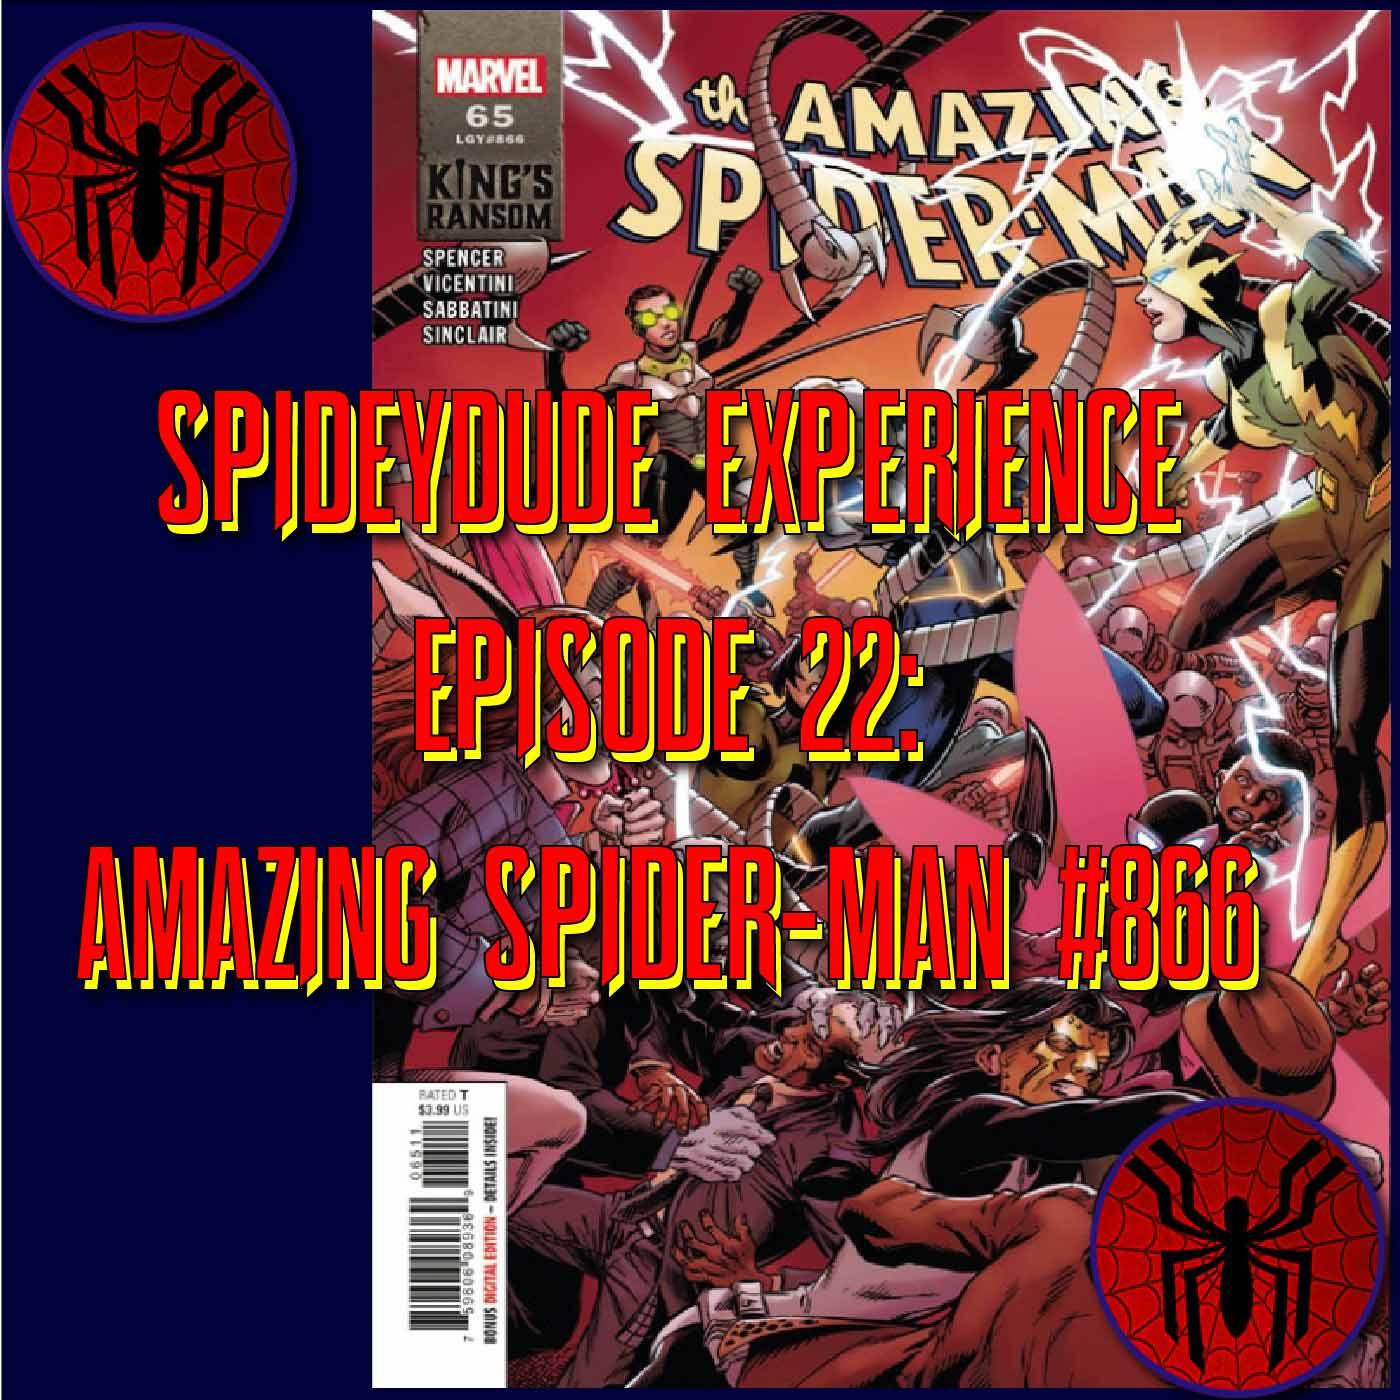 Spideydude Experience Episode 22: ASM 866 Audio Edition